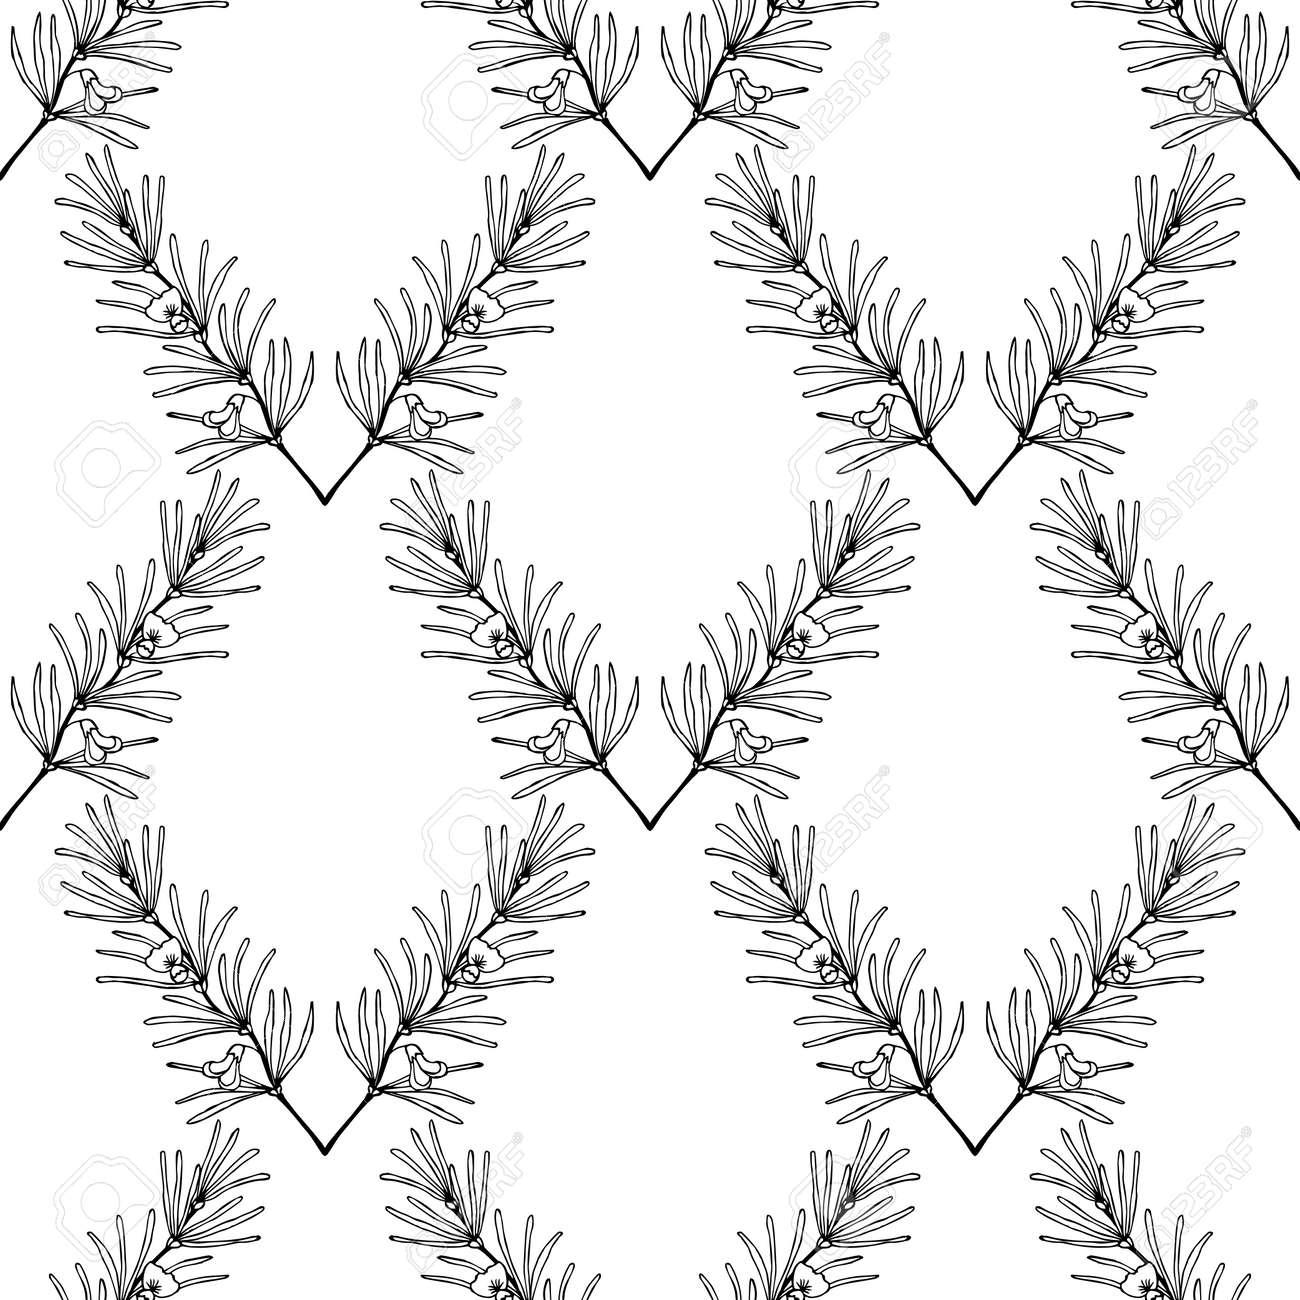 Rooibos Tea Plant Leaf Flower Seamless Pattern Hand Drawn Ink Sketch Illustration